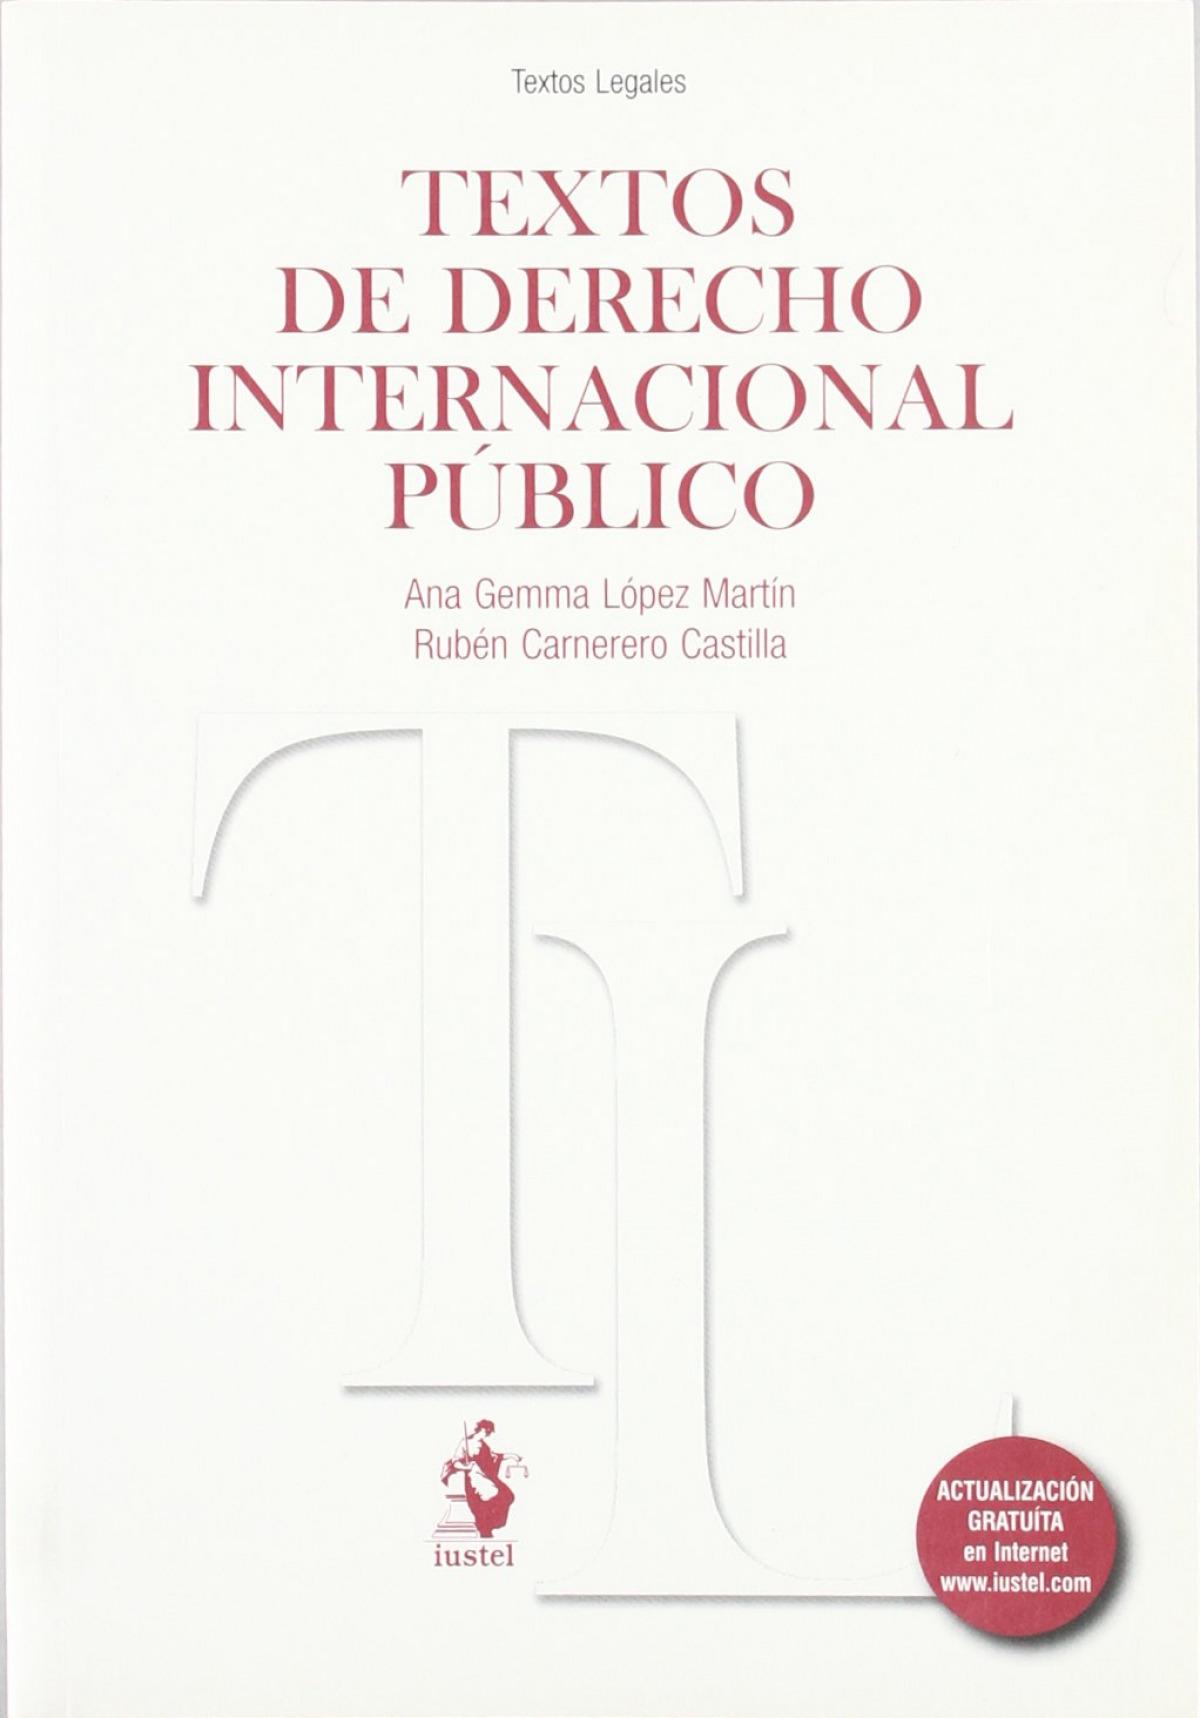 Textos derecho inter publico - Lopez, Ana